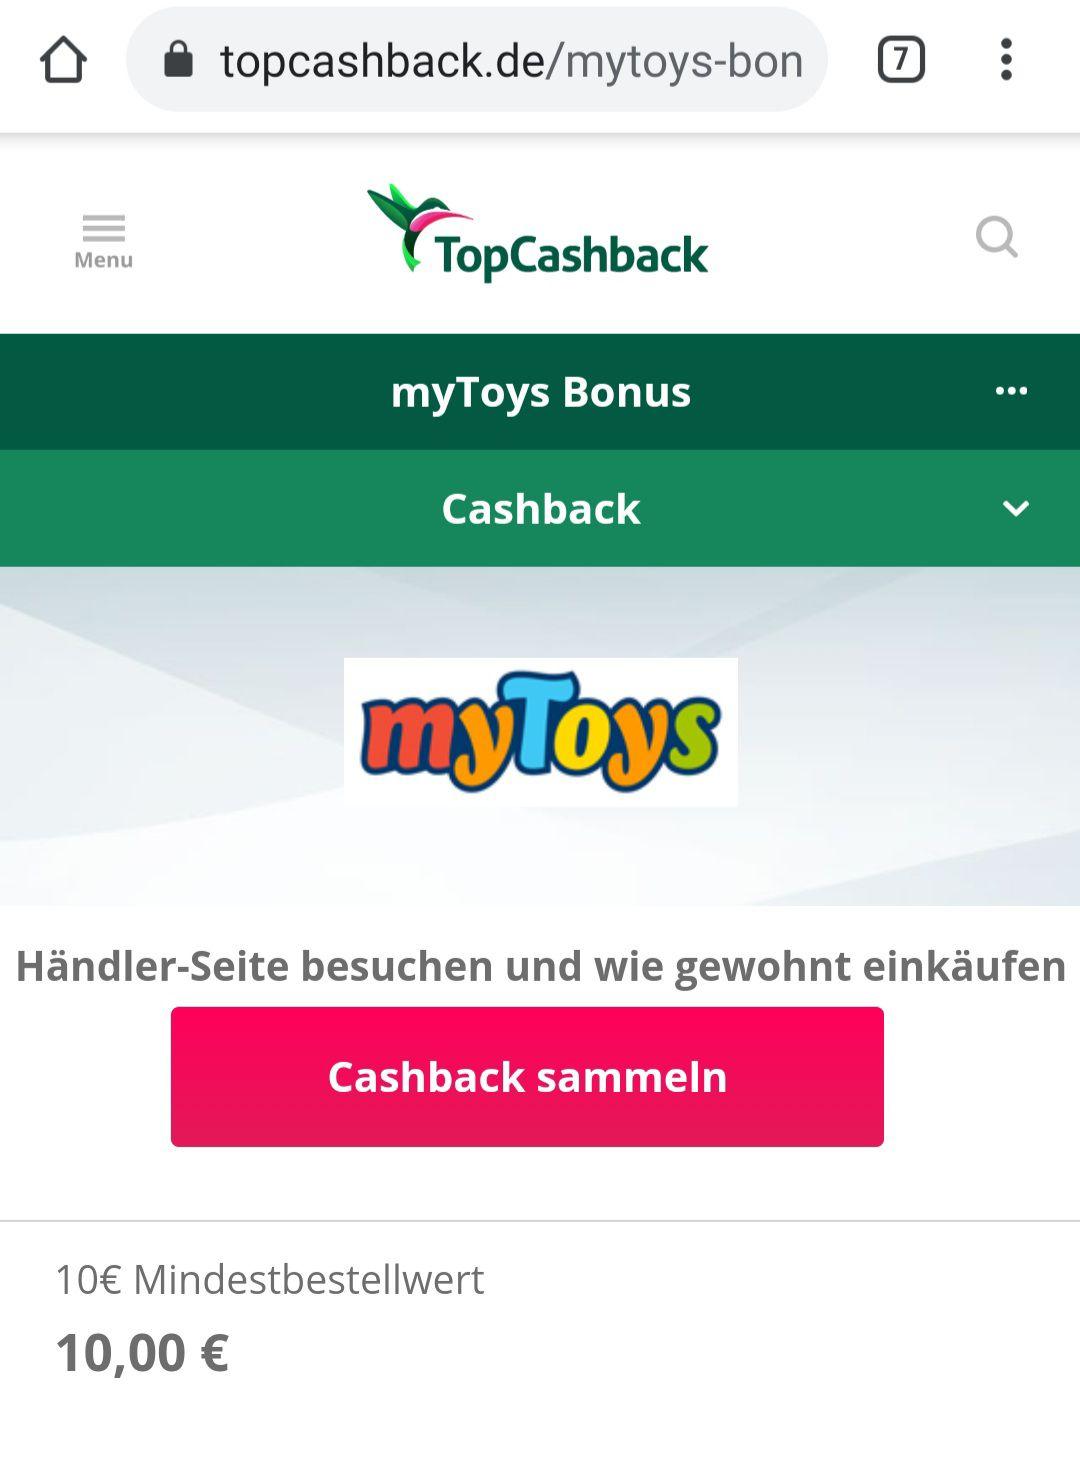 Neukunden, Topcashback - 10€ CB Bonus + weitere 6% CB bei MyToys, ab 10€ MBW